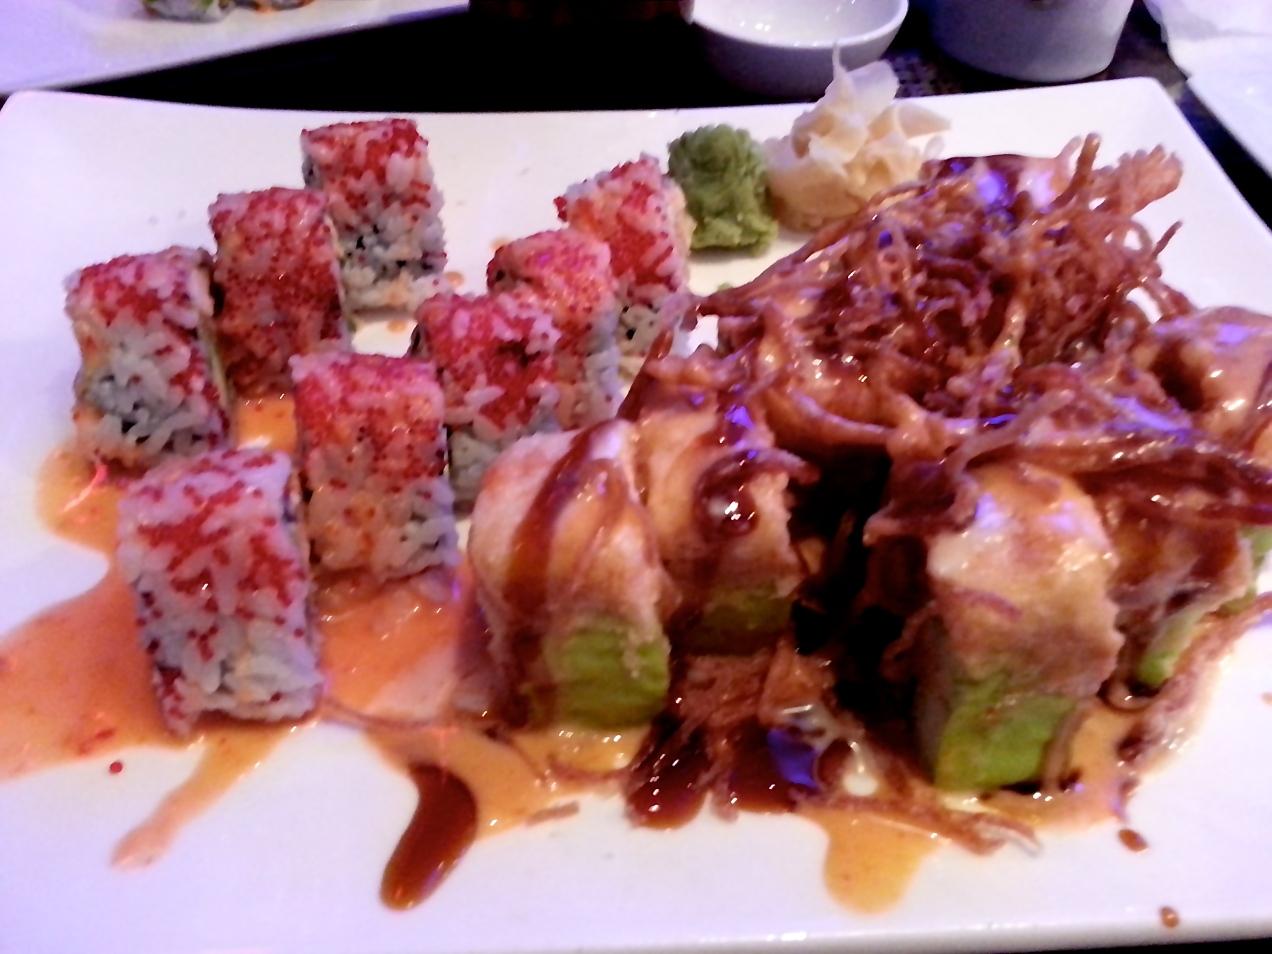 Sushi from Kumo